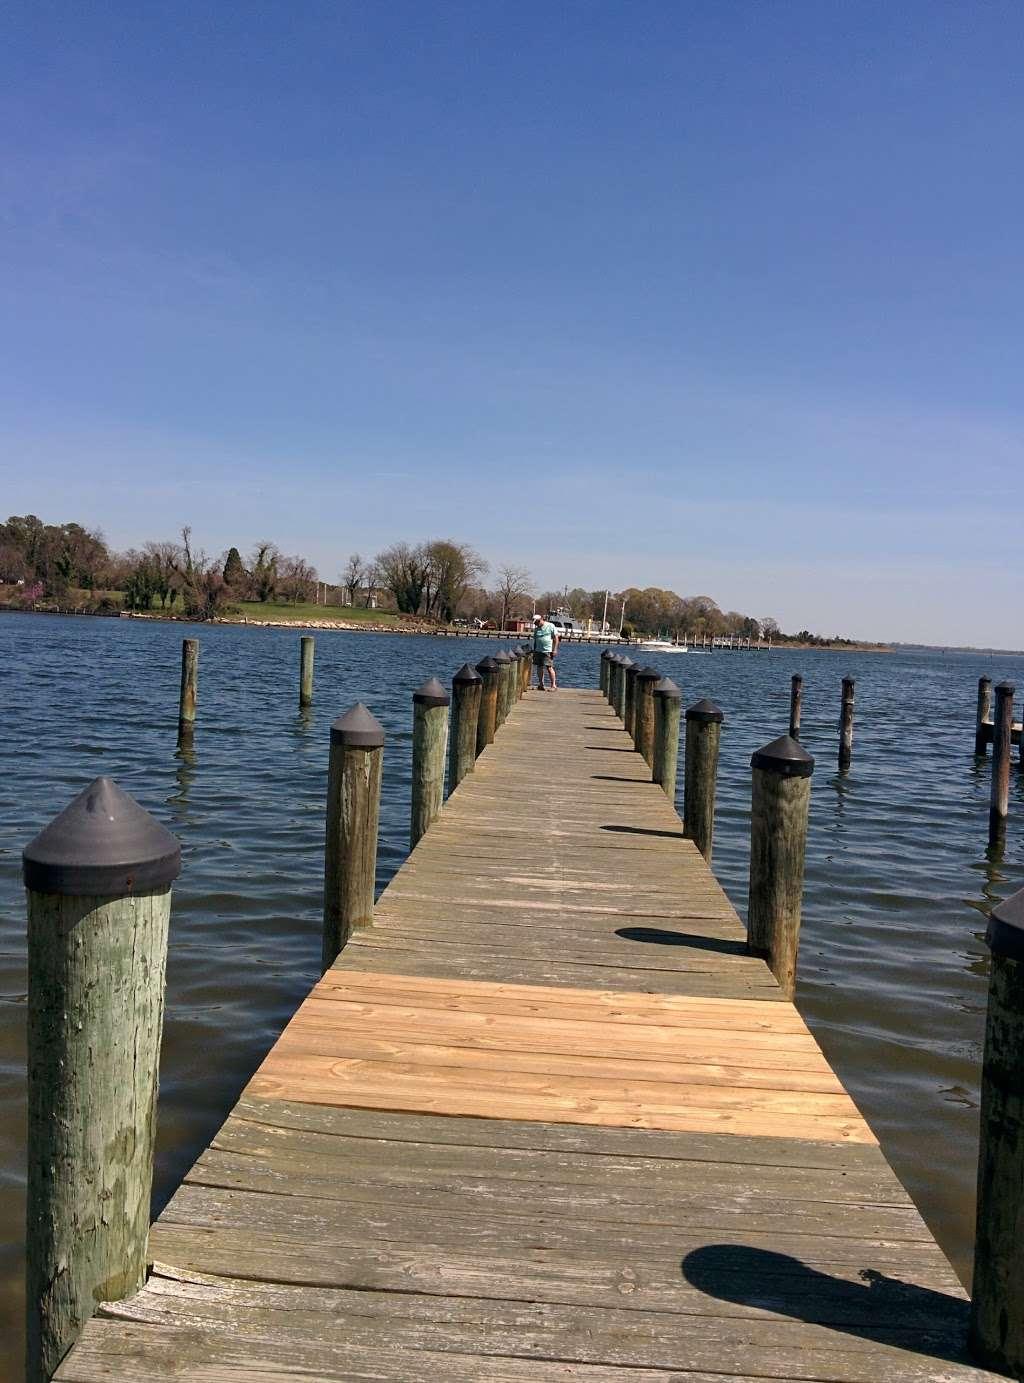 Back Creek Inn - lodging  | Photo 10 of 10 | Address: 210 Alexander St, Solomons, MD 20688, USA | Phone: (410) 326-2022